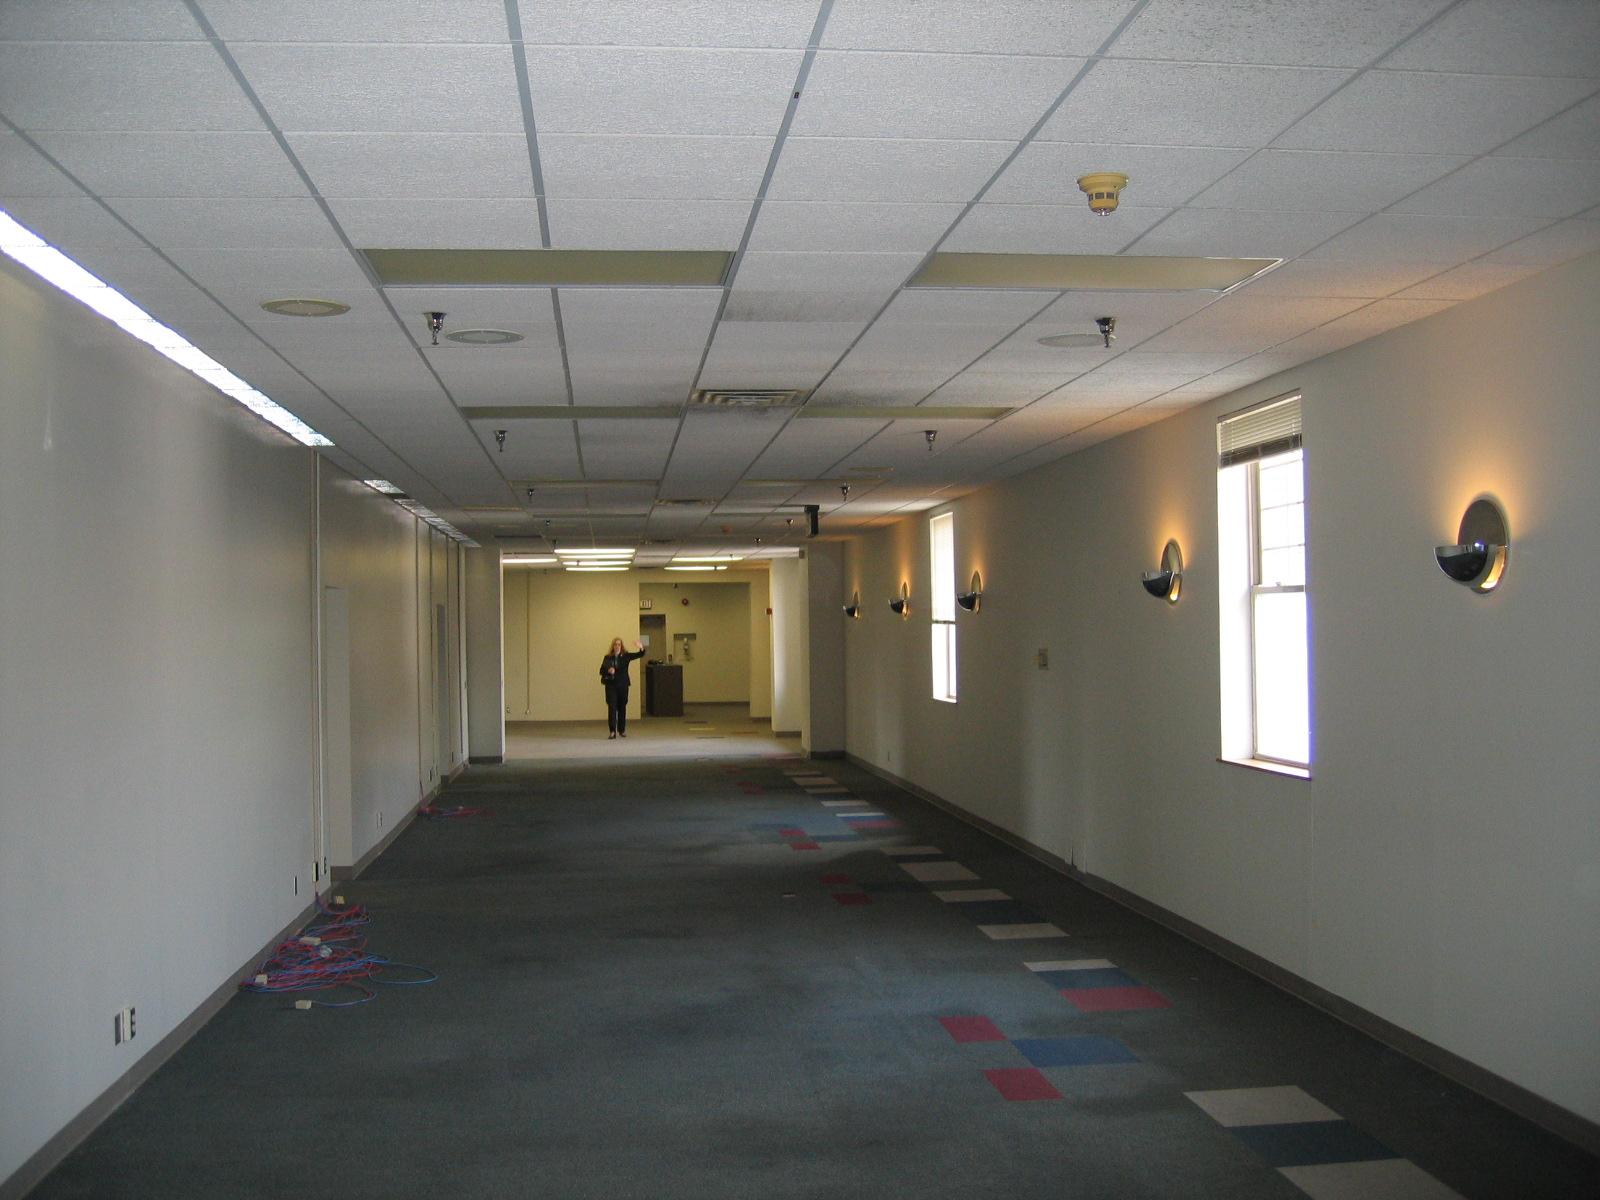 deaf school_corridor 7.JPG